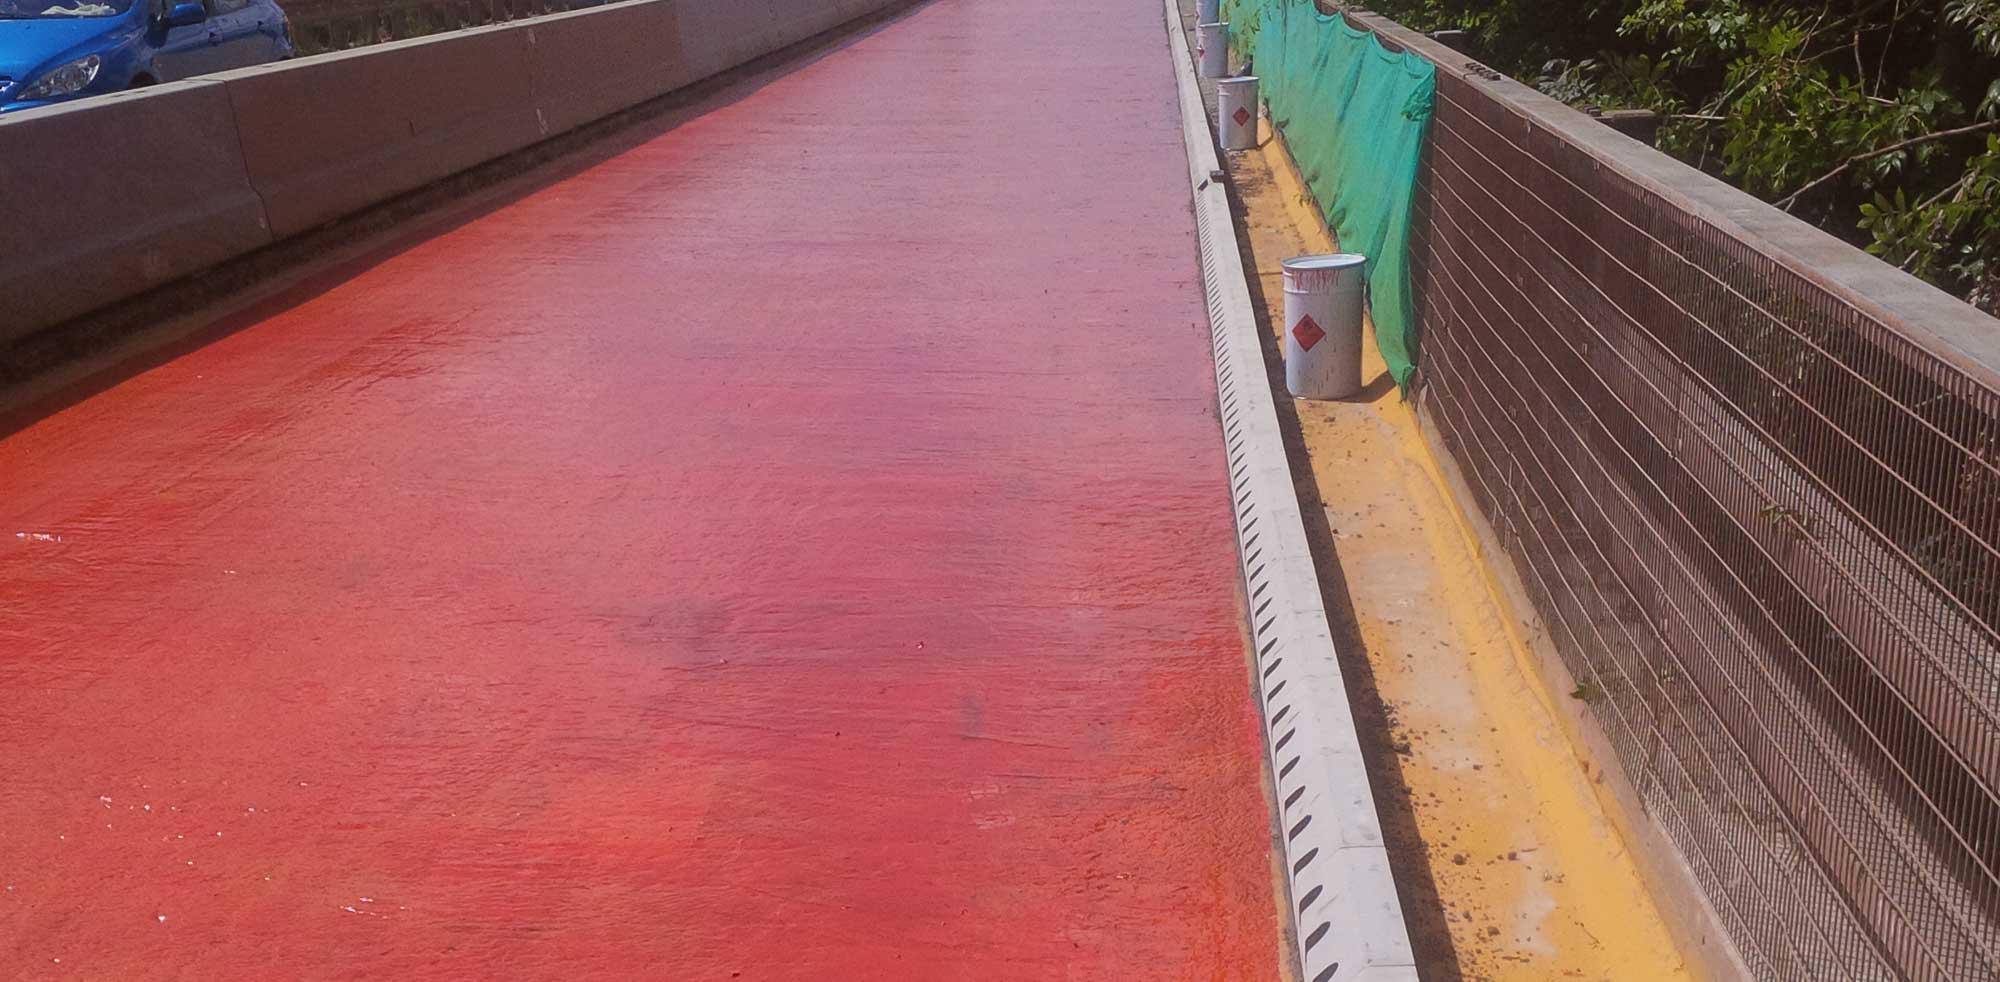 Bridge Deck Waterproofing By Maintenance Plus Ltd